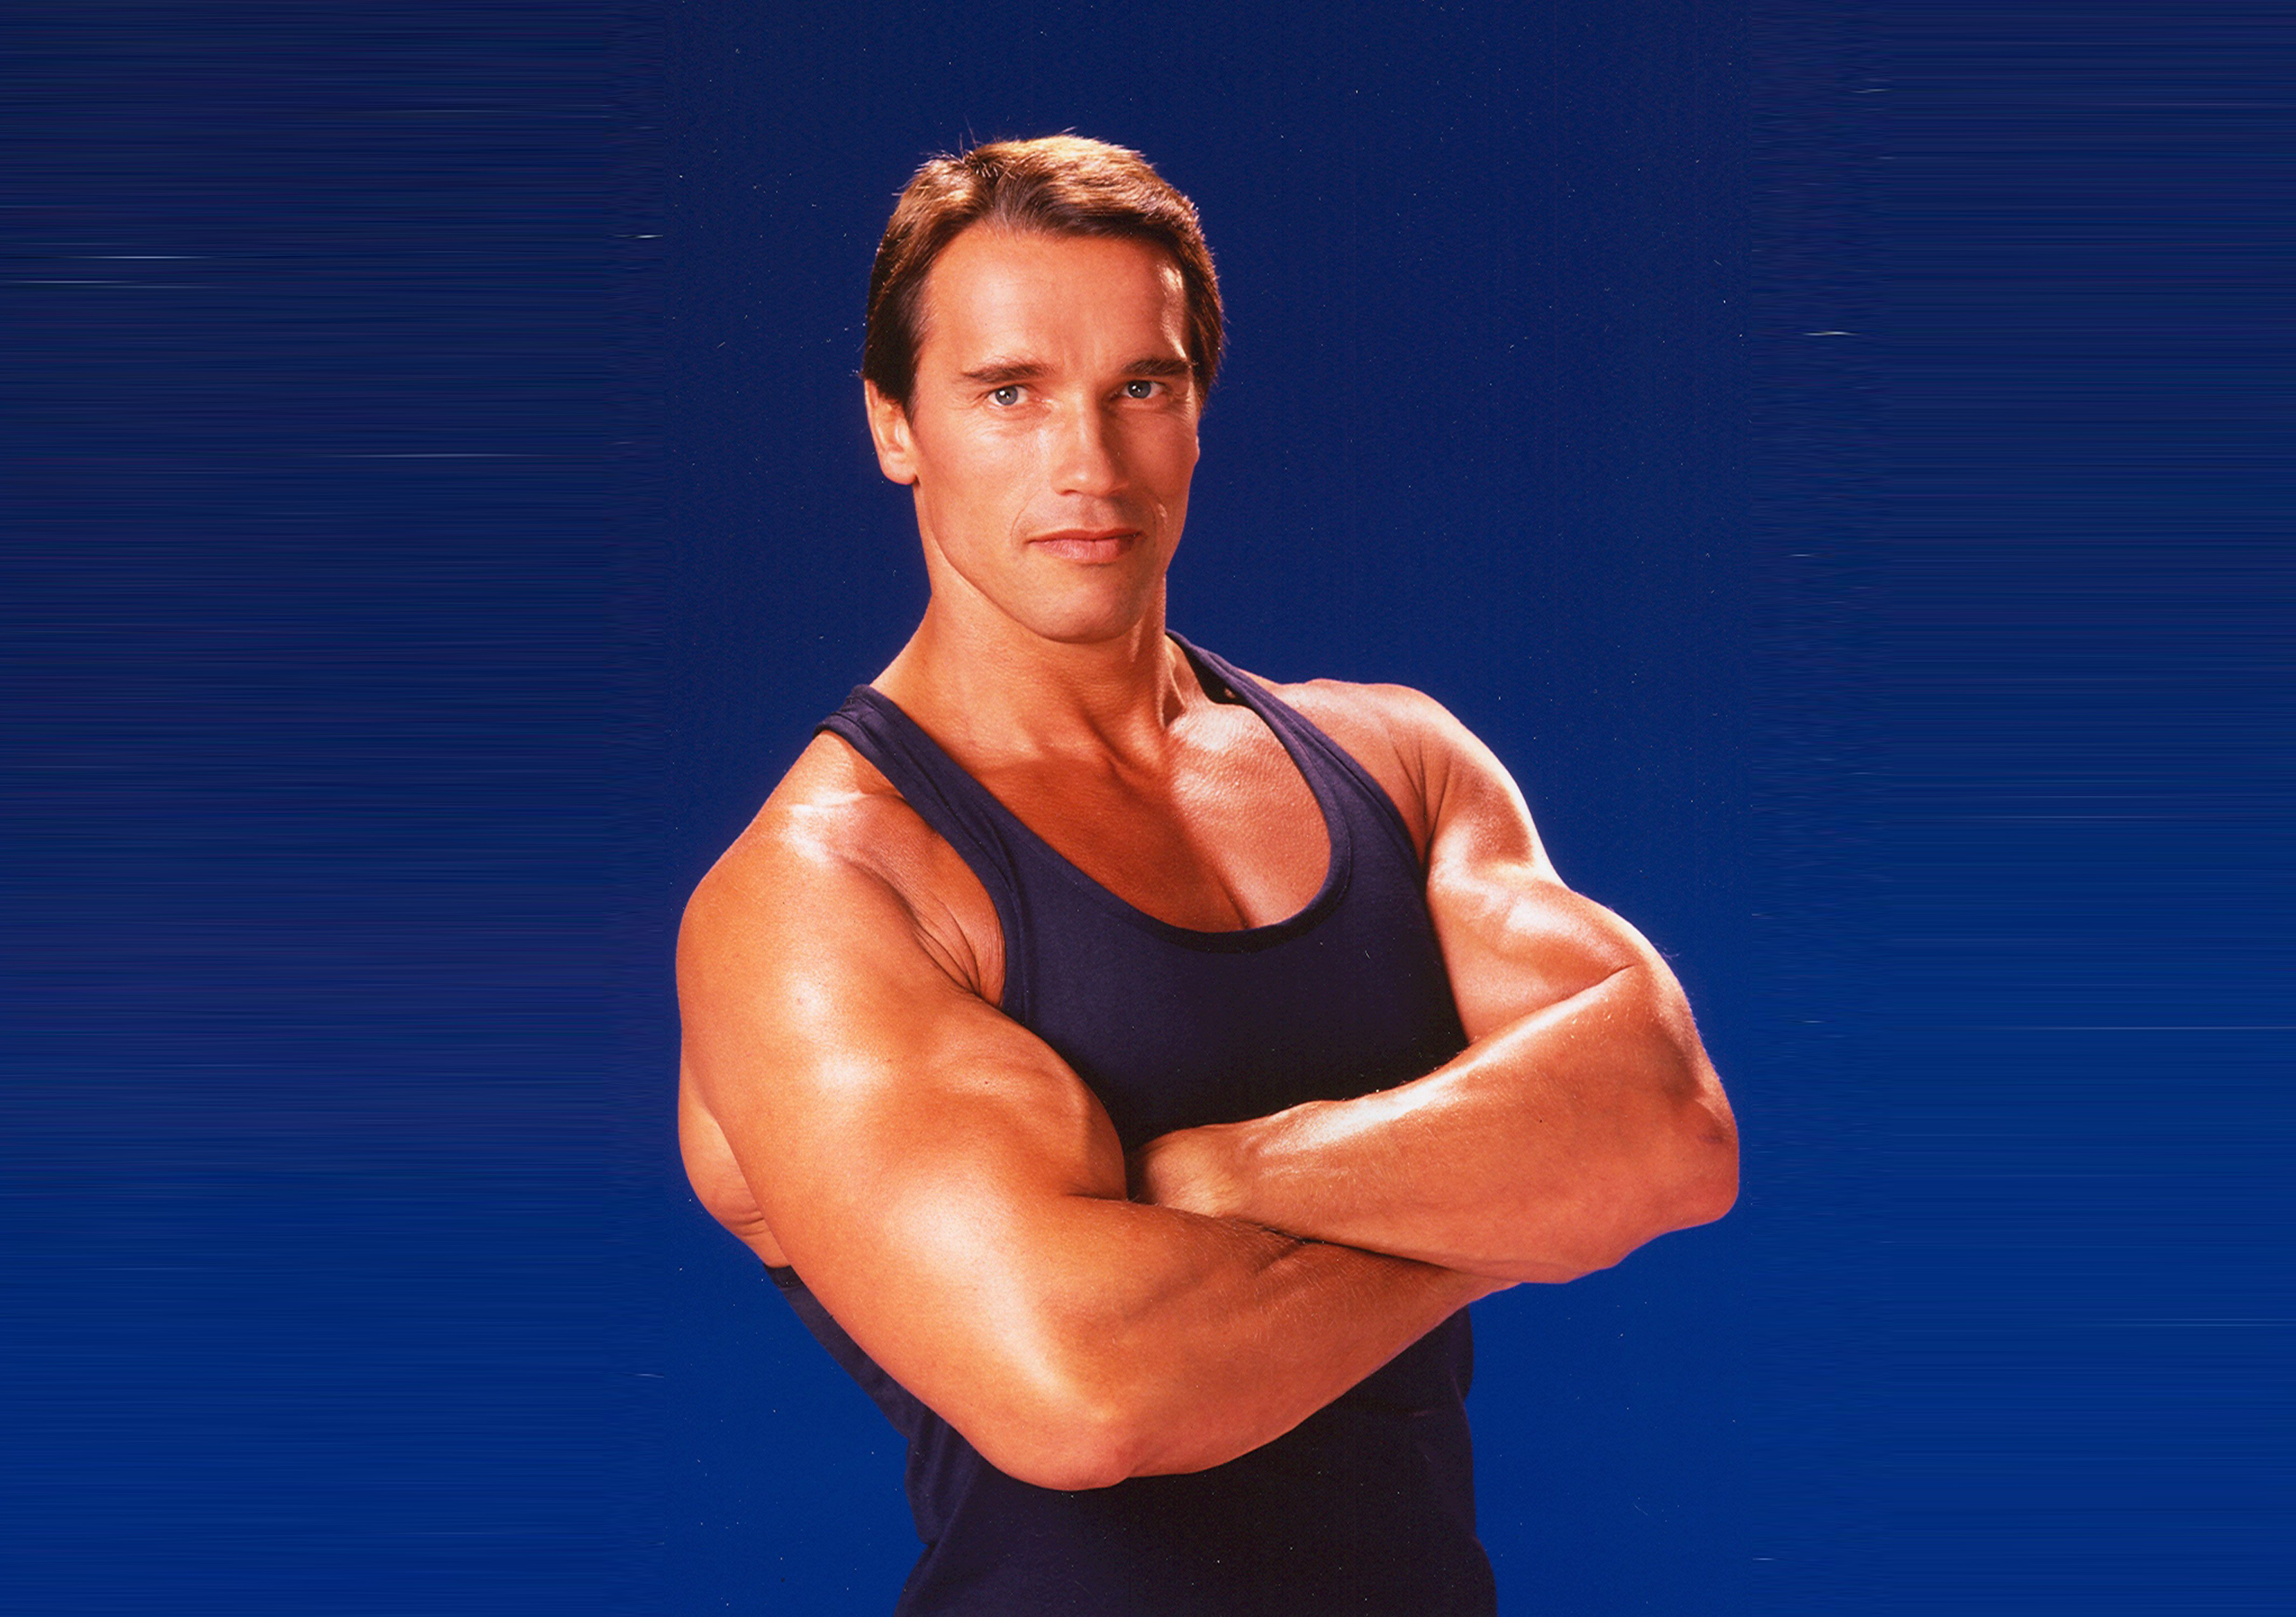 Арнольд Шварценеггер Arnold Schwarzenegger Арнольд